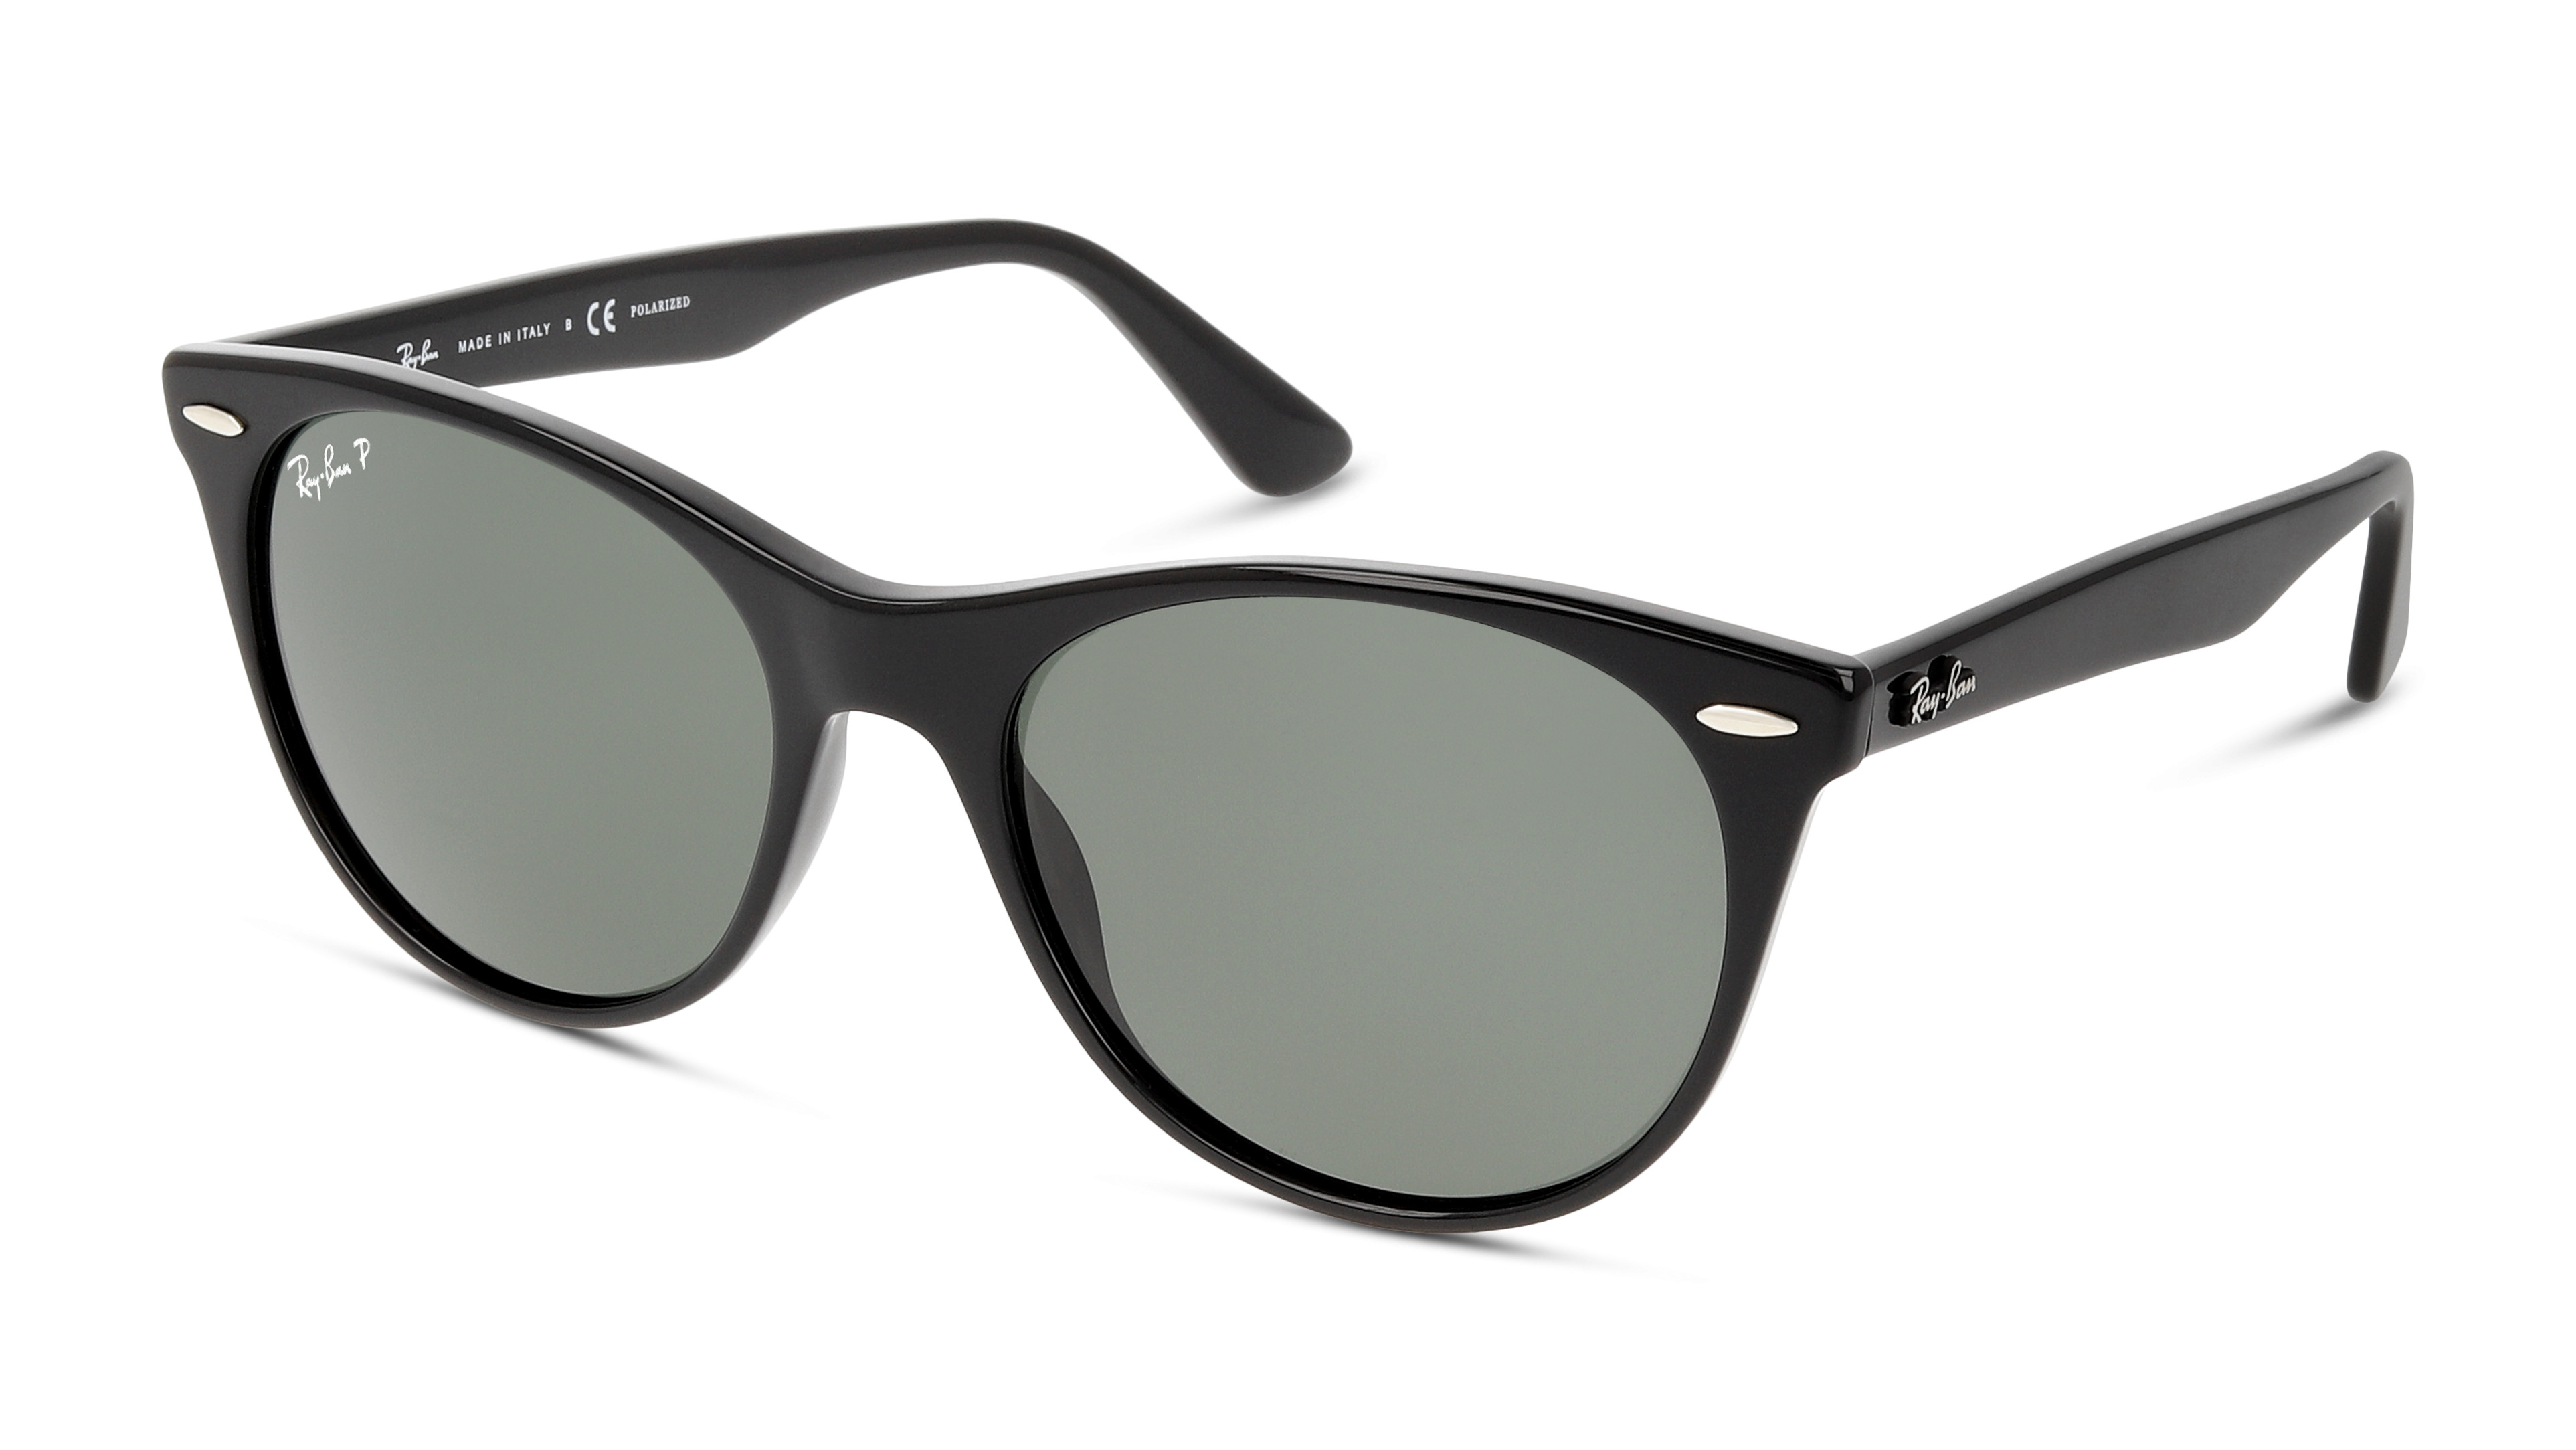 8056597044585-angle-03-ray-ban-0rb2185-eyewear-black